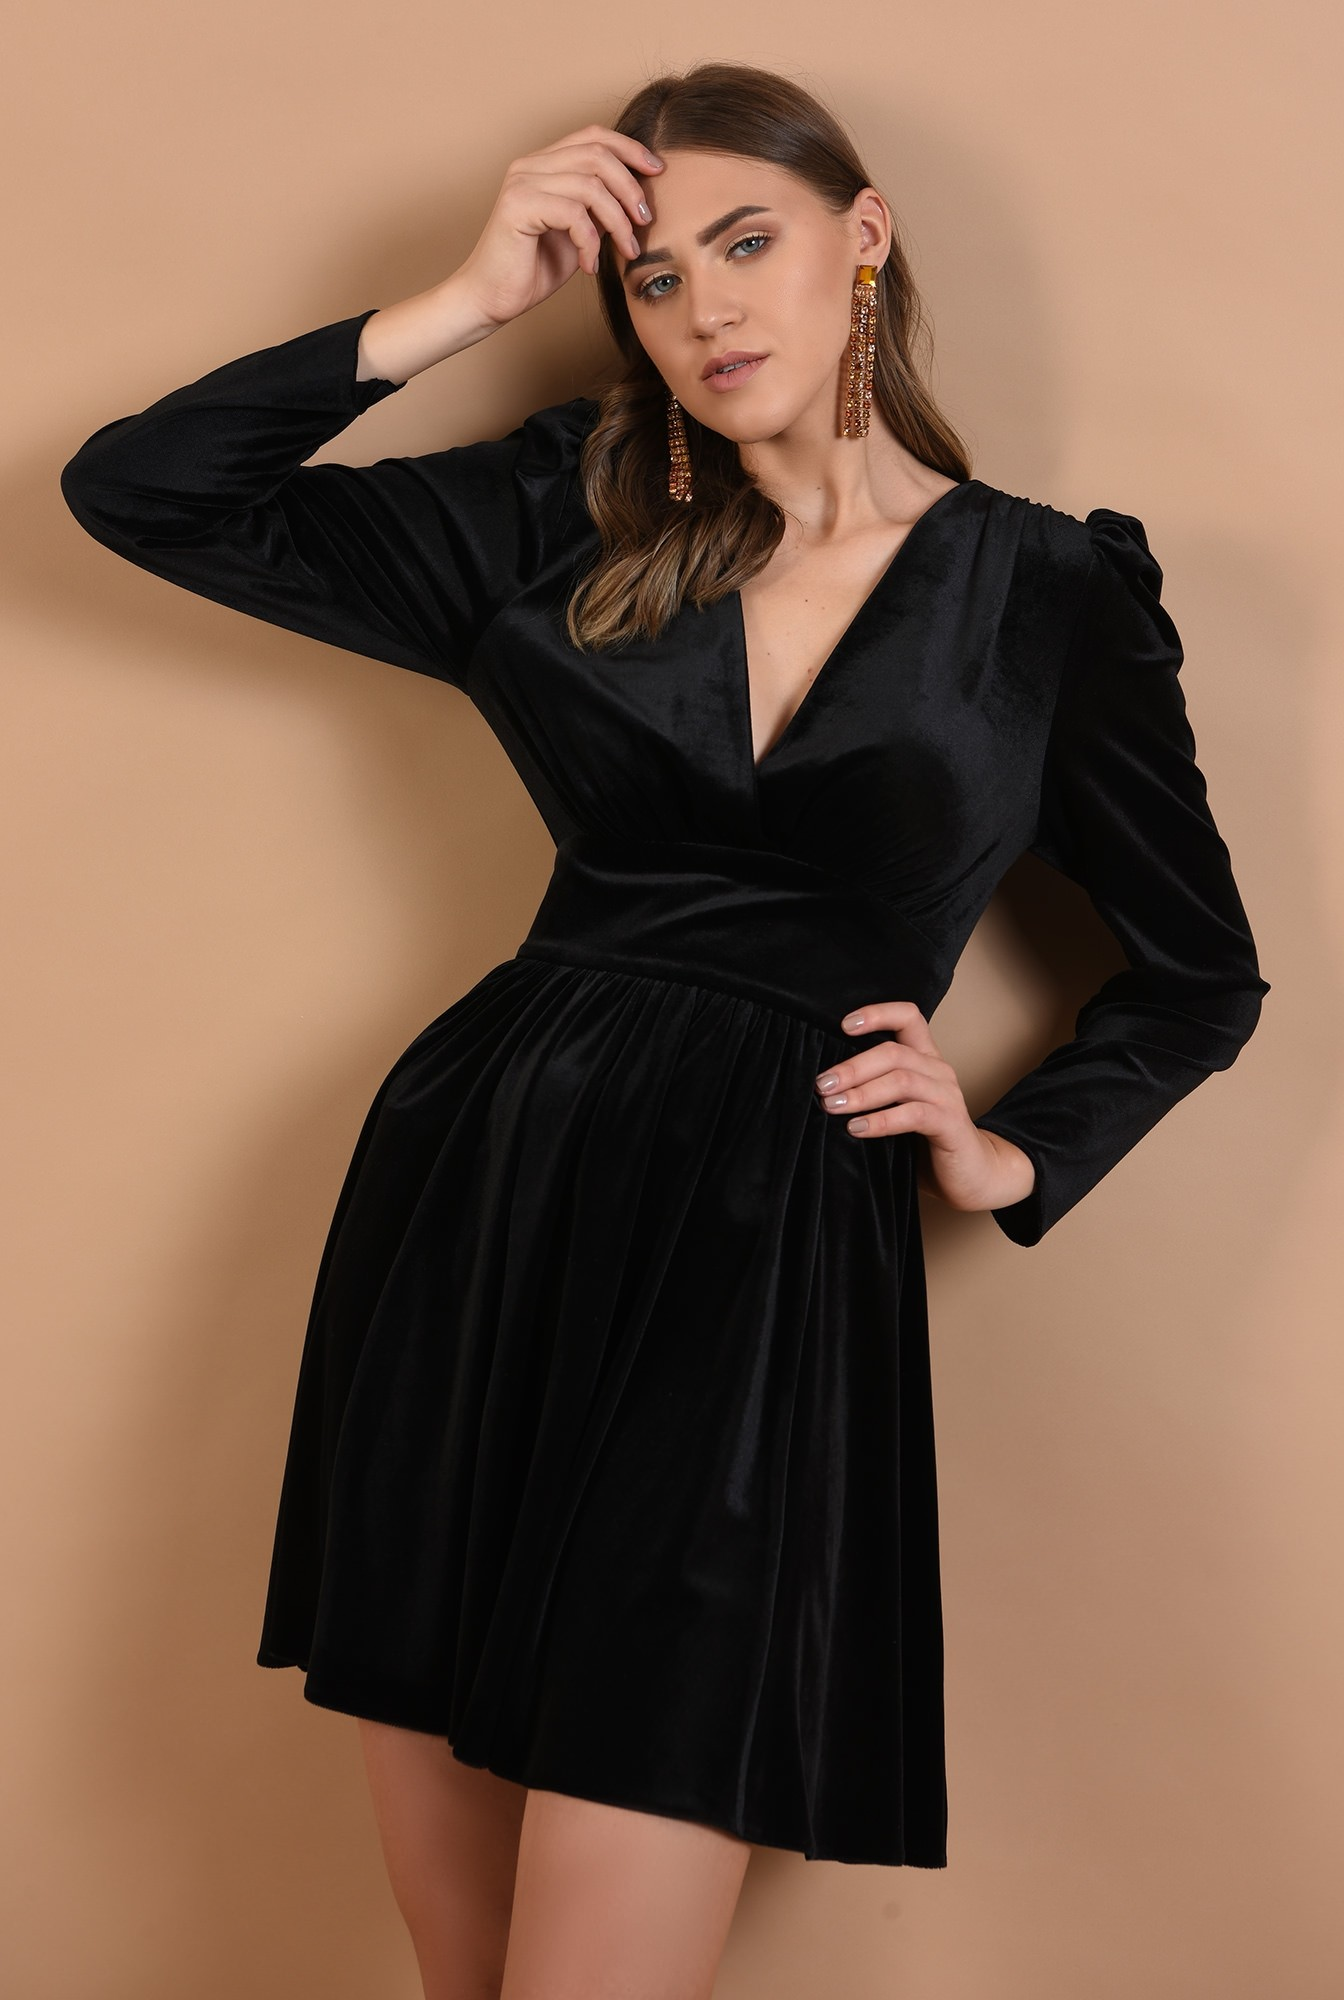 0 - rochie eleganta, din catifea, neagra, scurta